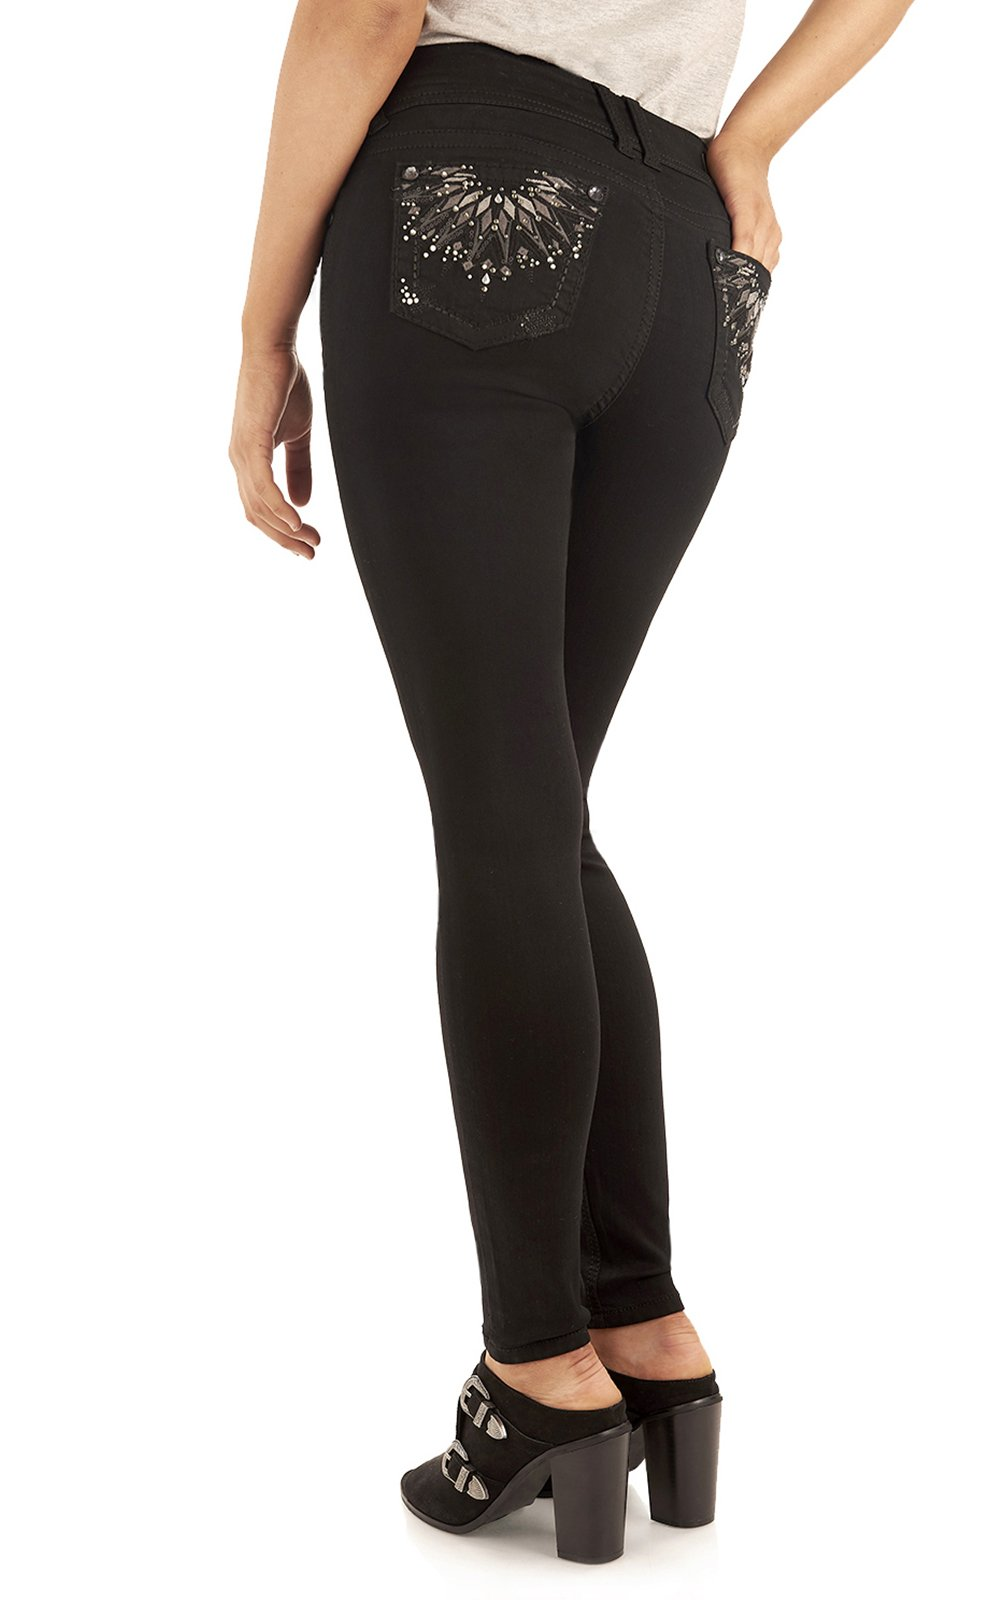 WallFlower Women's Juniors Luscious Curvy Bling Skinny Jeggings in Black, 7